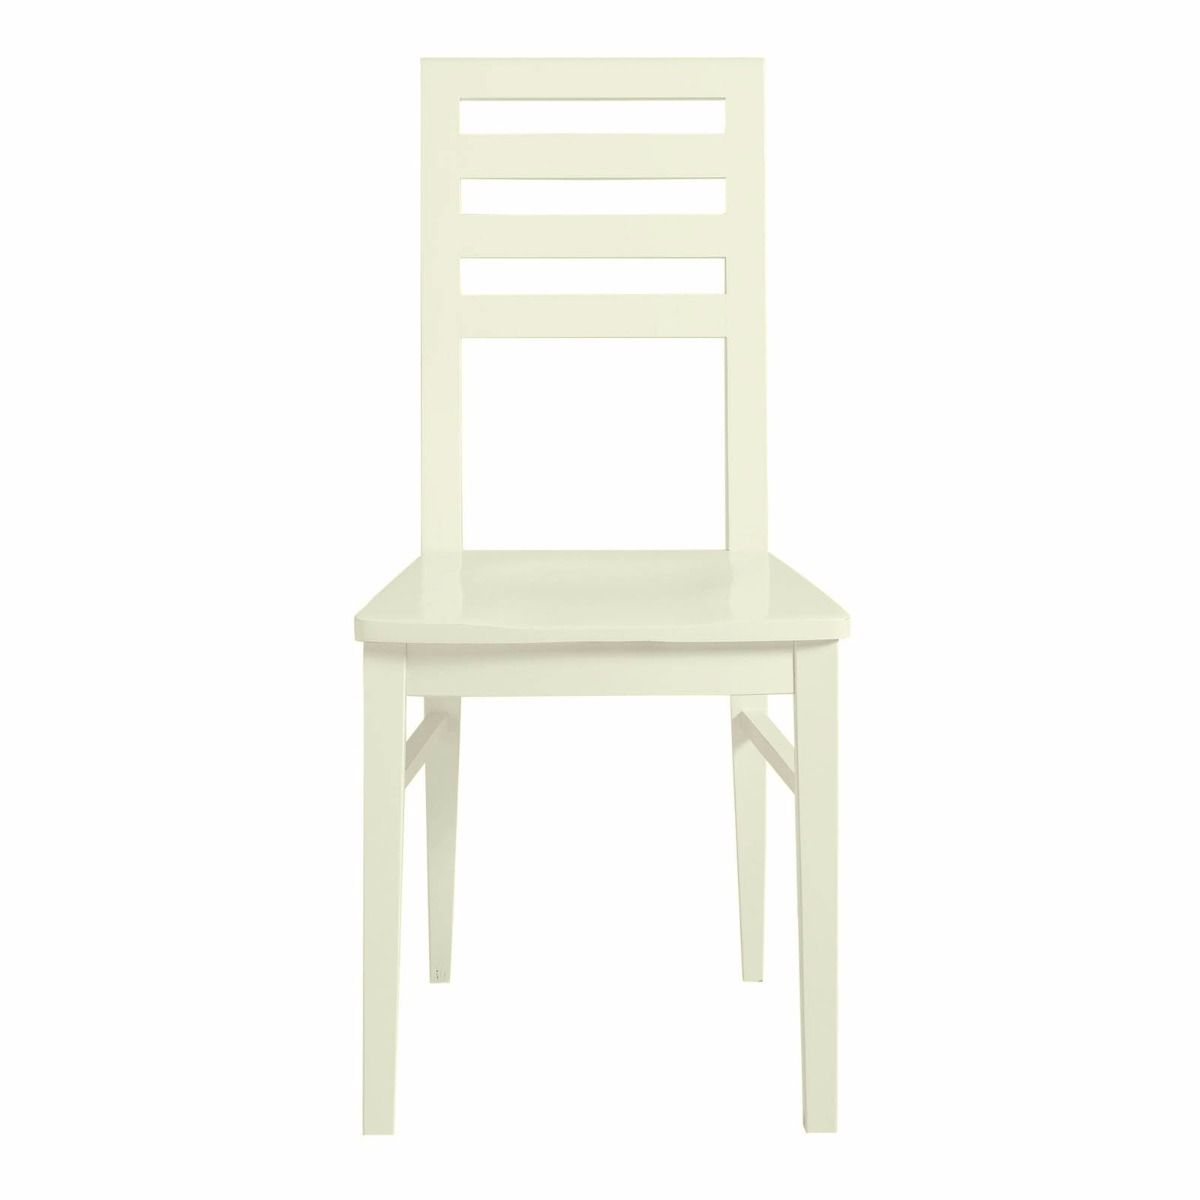 Fargo Ladderback Chair - Ivory White by Little Folks